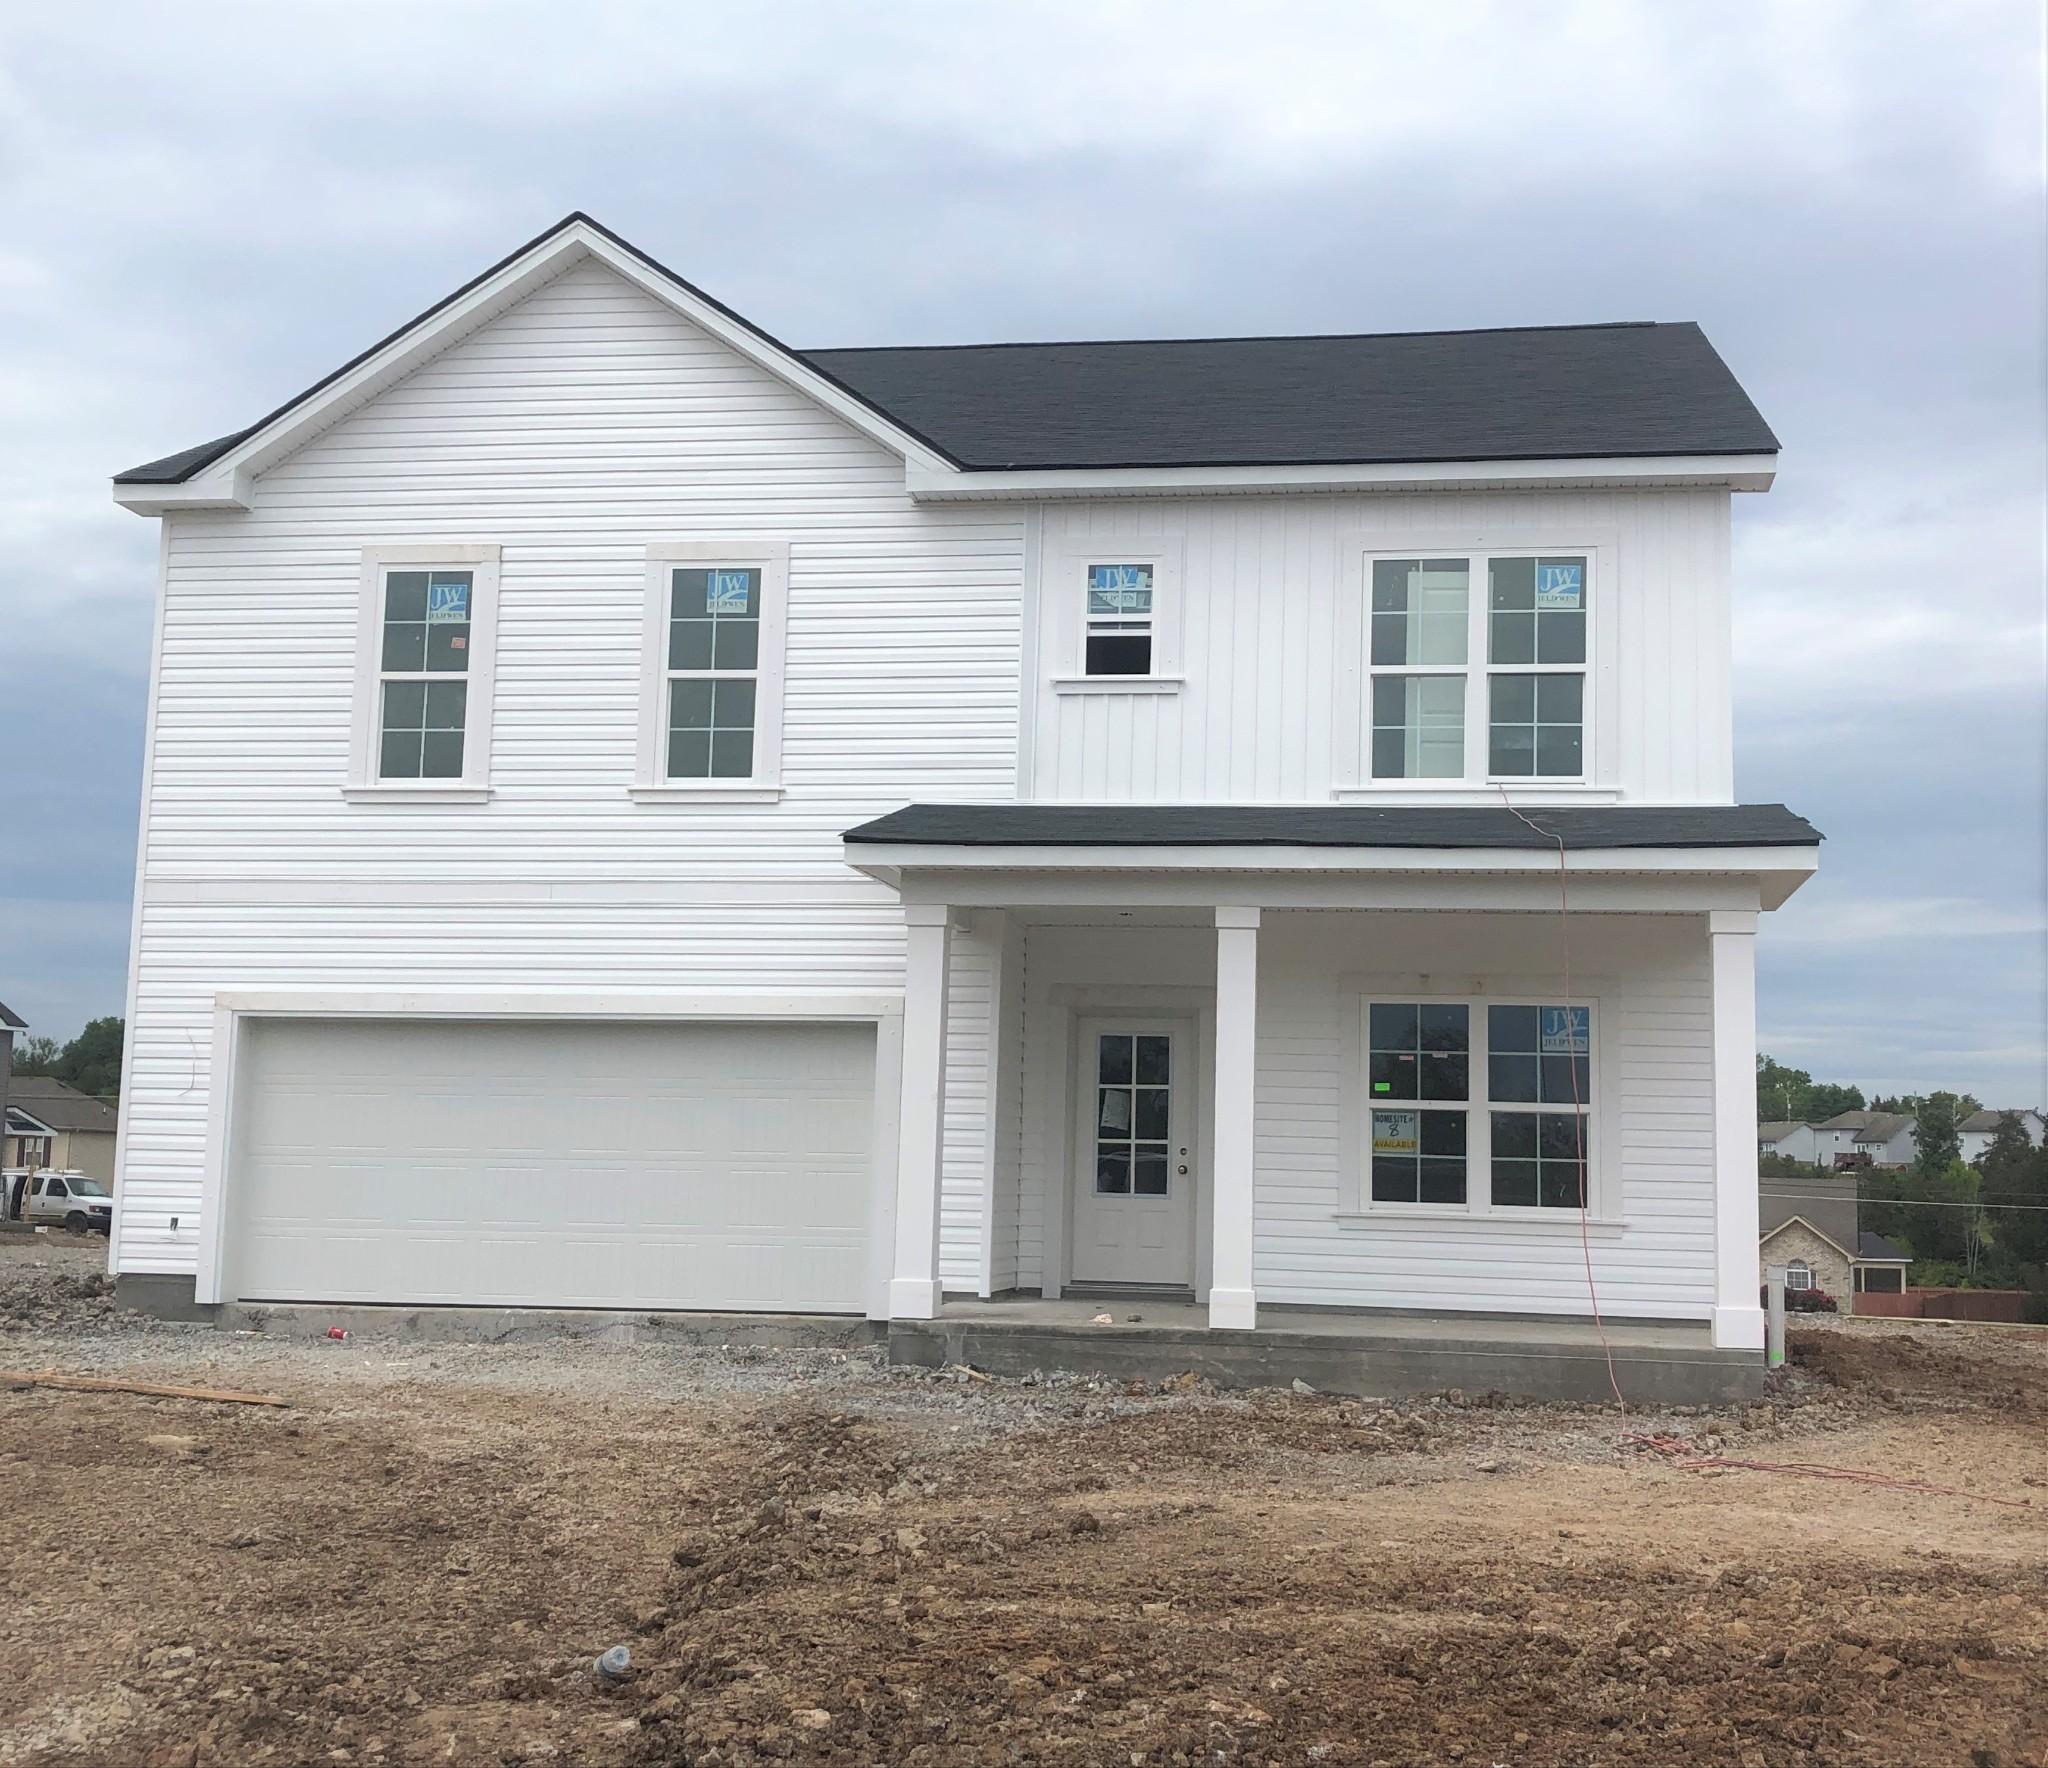 206 Biraj Ct, Smyrna, TN 37167 - Smyrna, TN real estate listing